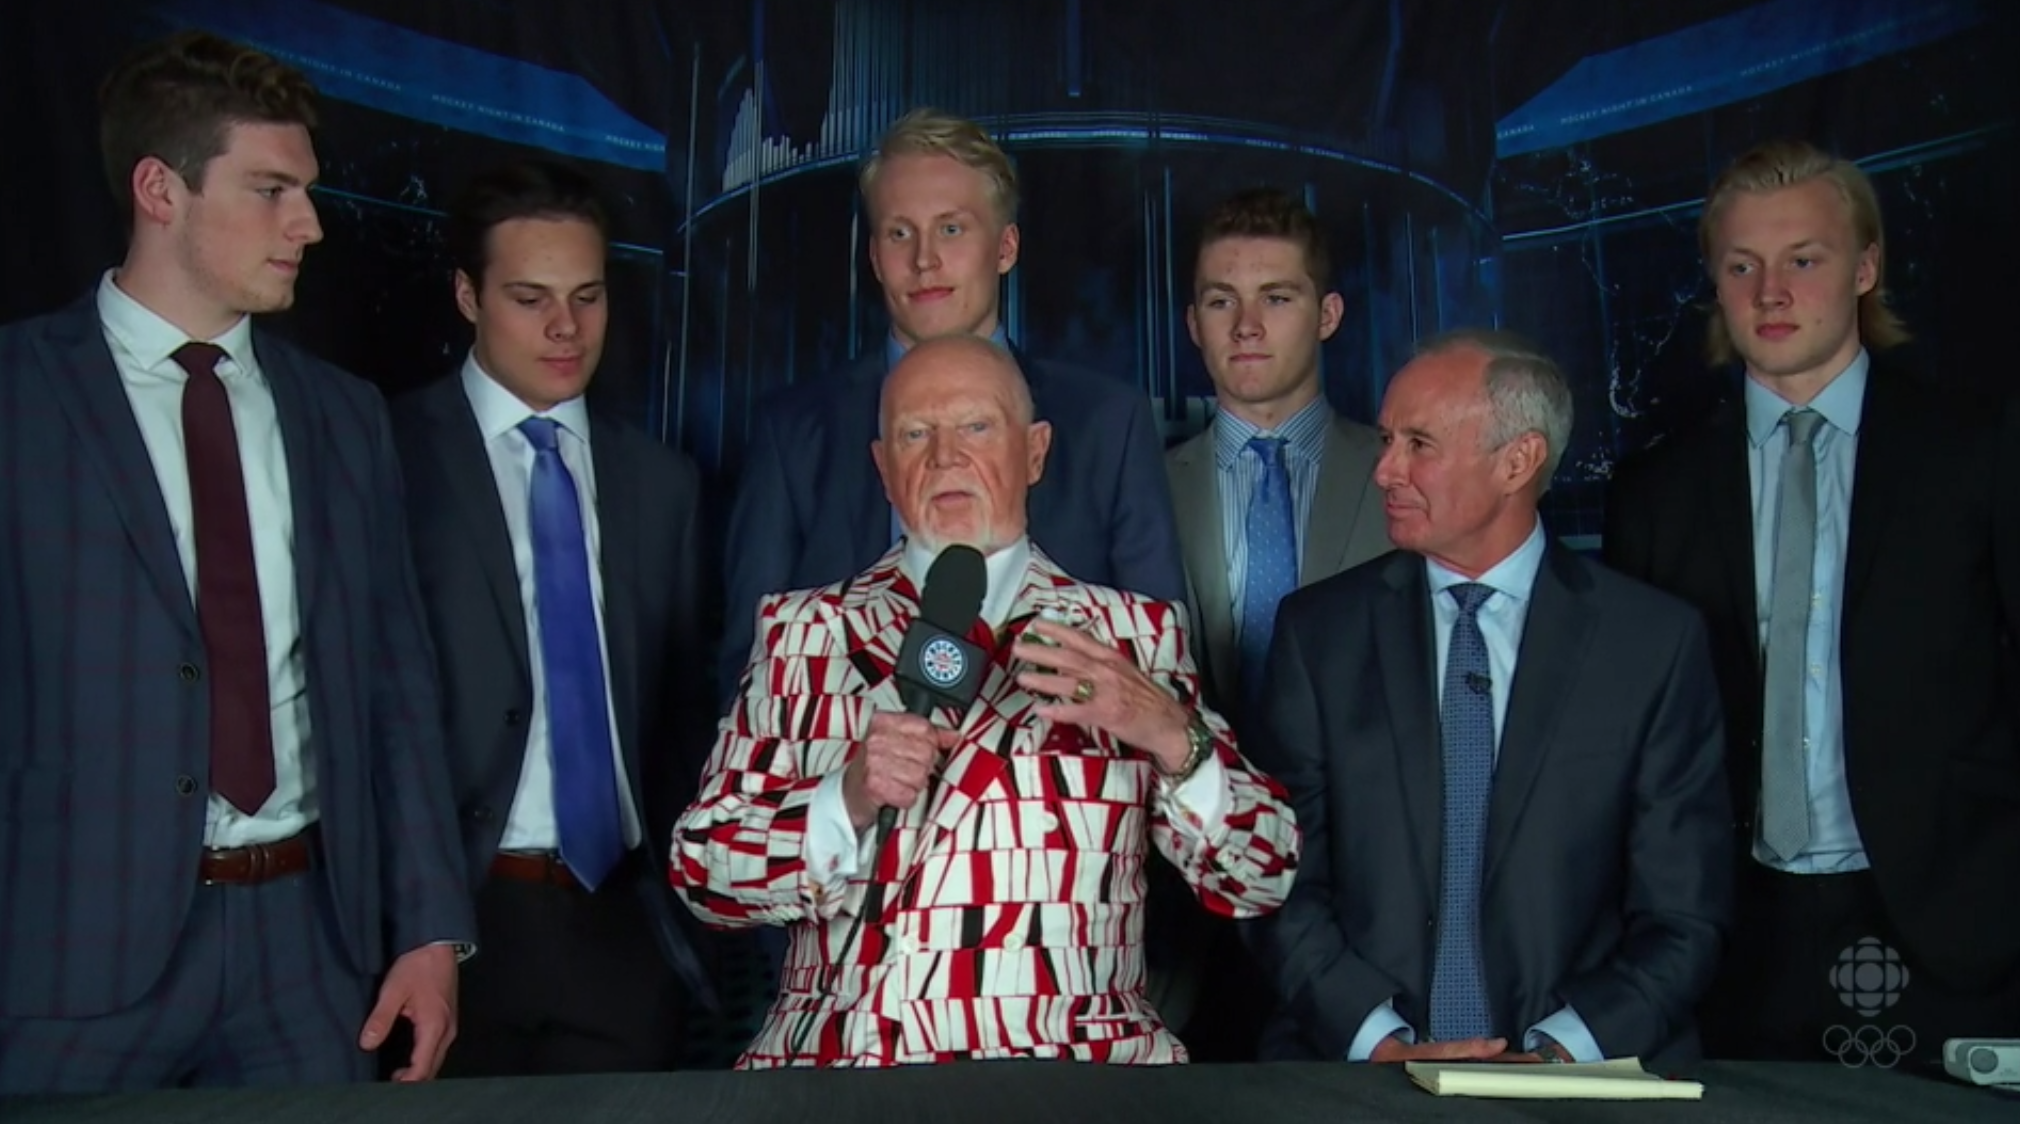 Coach's Corner: Cherry meets top 2016 NHL Draft prospects